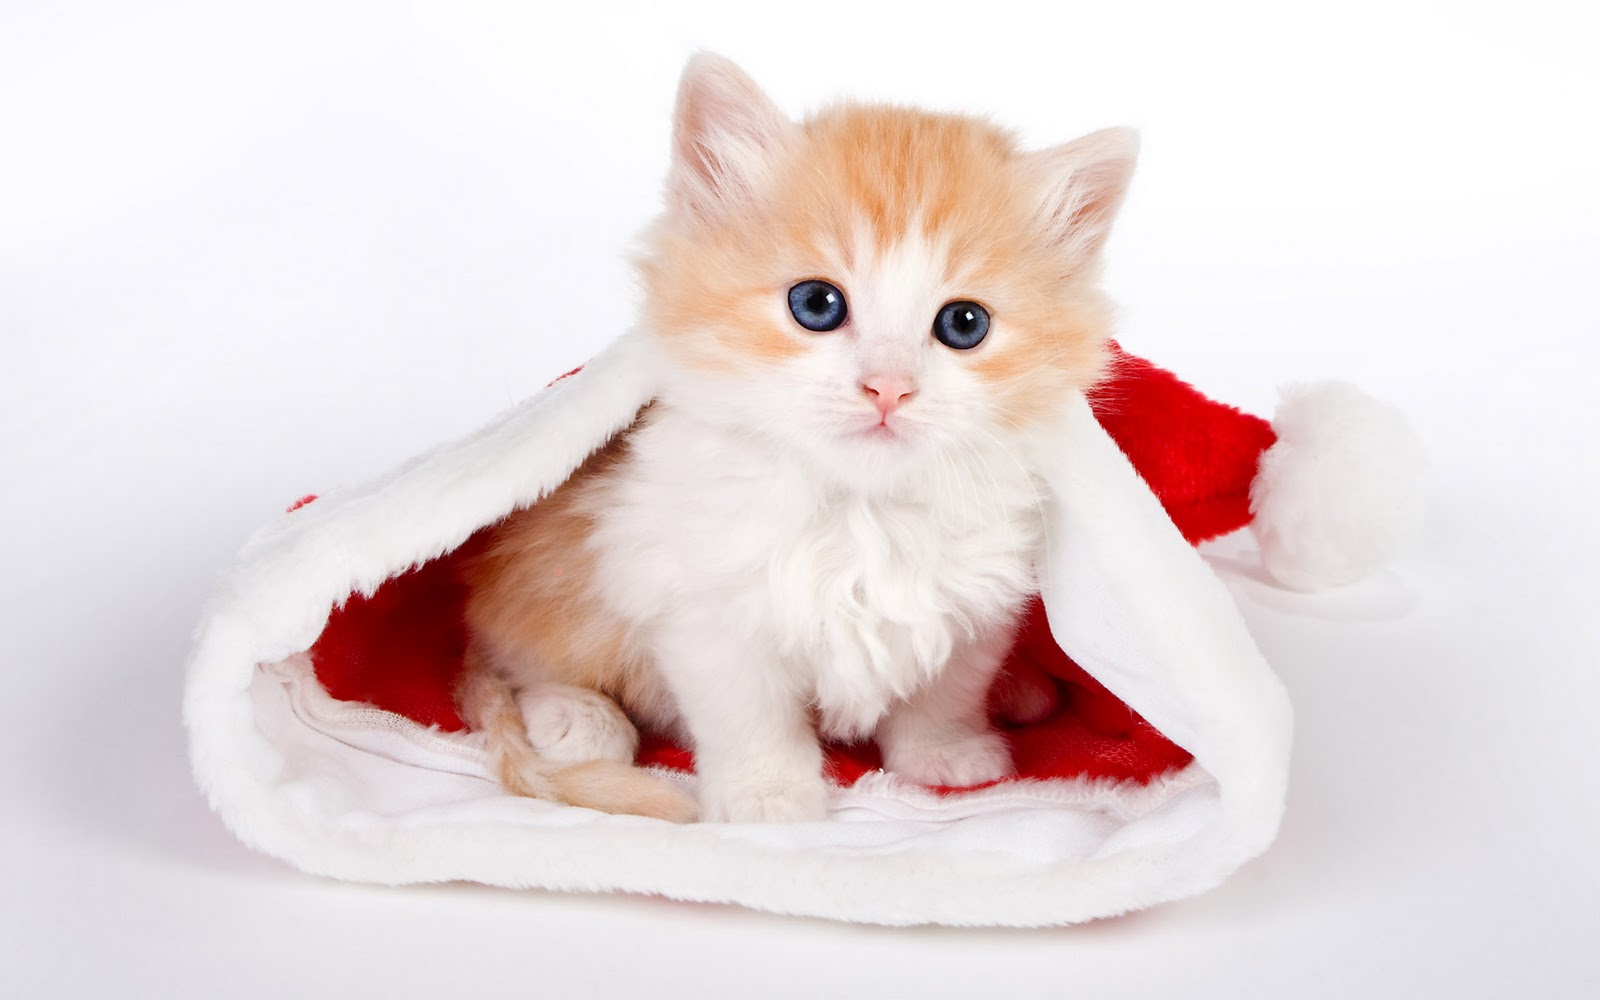 بالصور صور قطط متحركة , صور قطط كيوت 6317 2